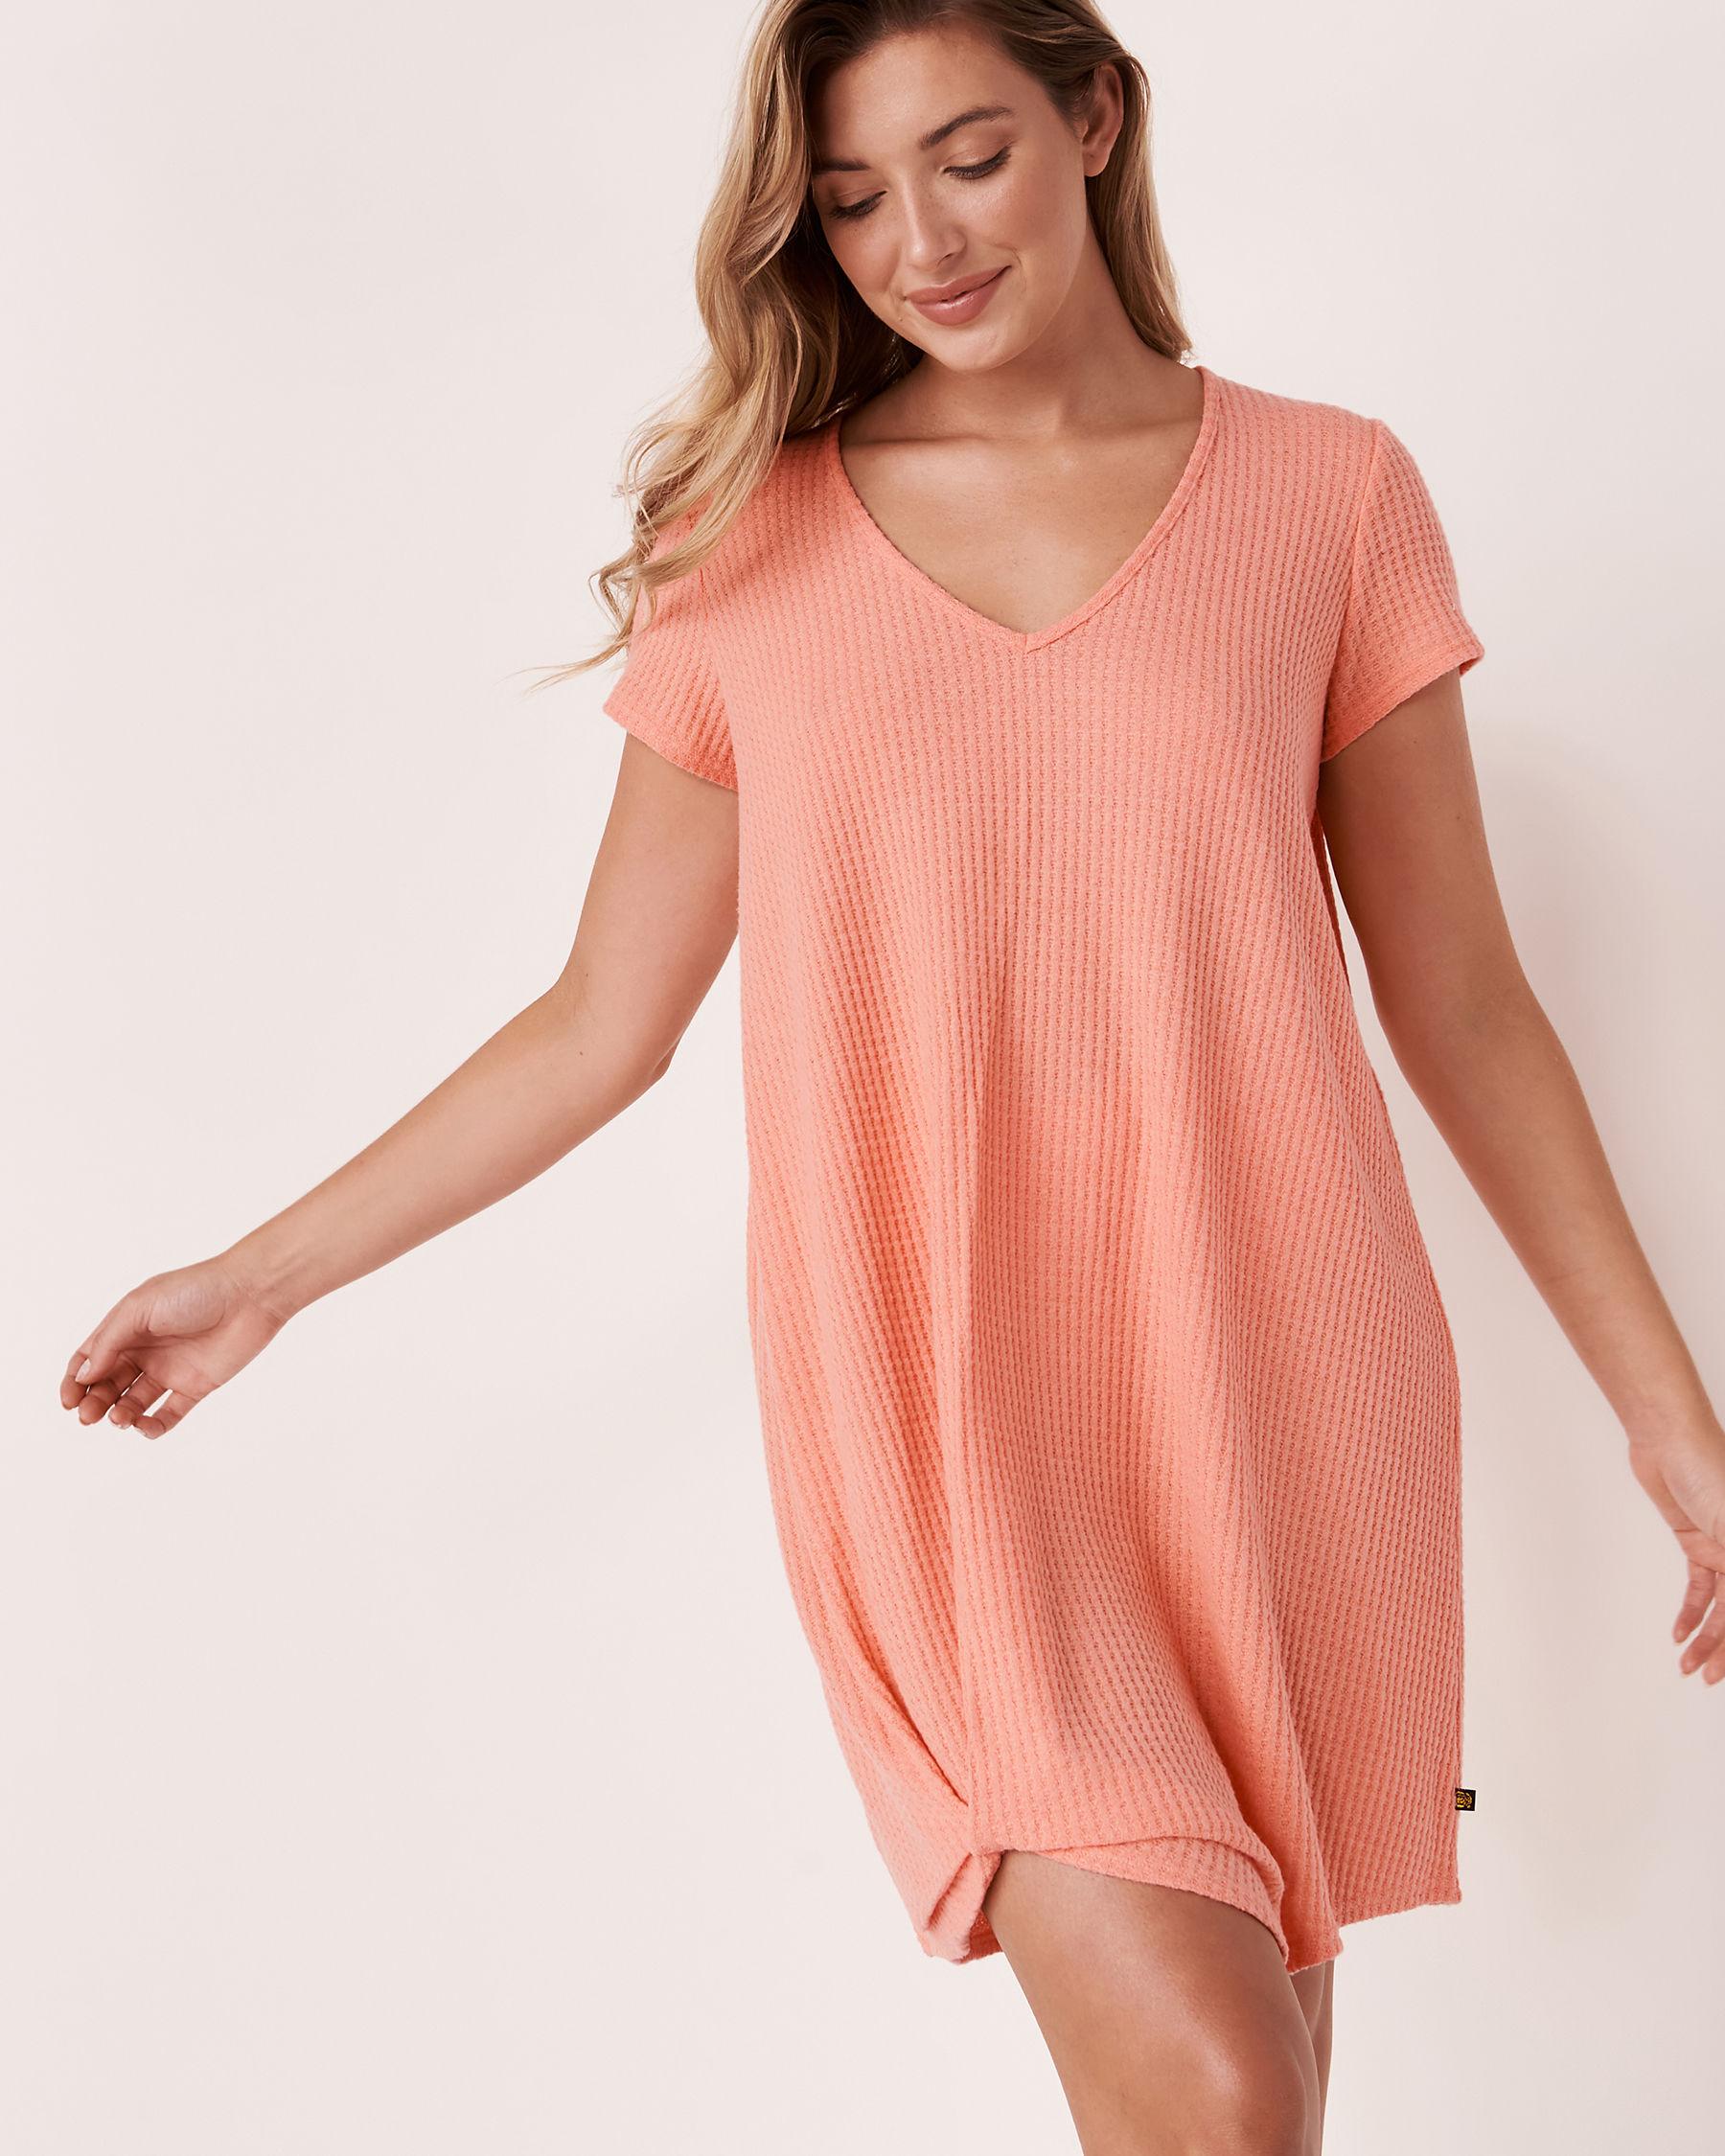 LA VIE EN ROSE AQUA Twisted Short Dress Coral 80300017 - View1